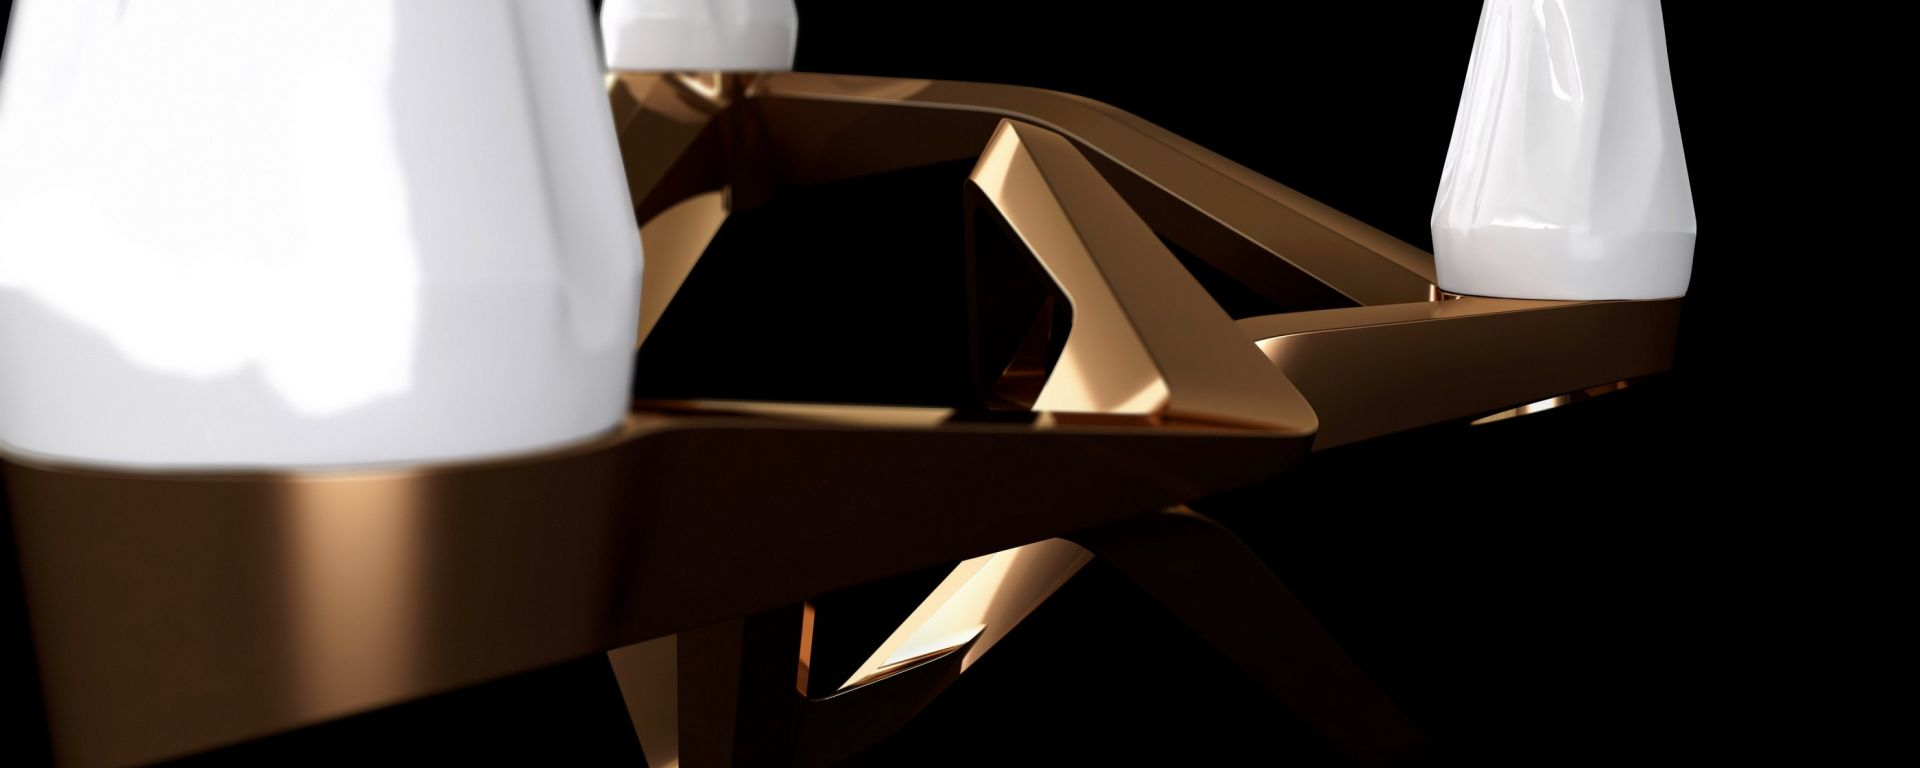 Peugeot Design Lab: ecco le lampade ONYX